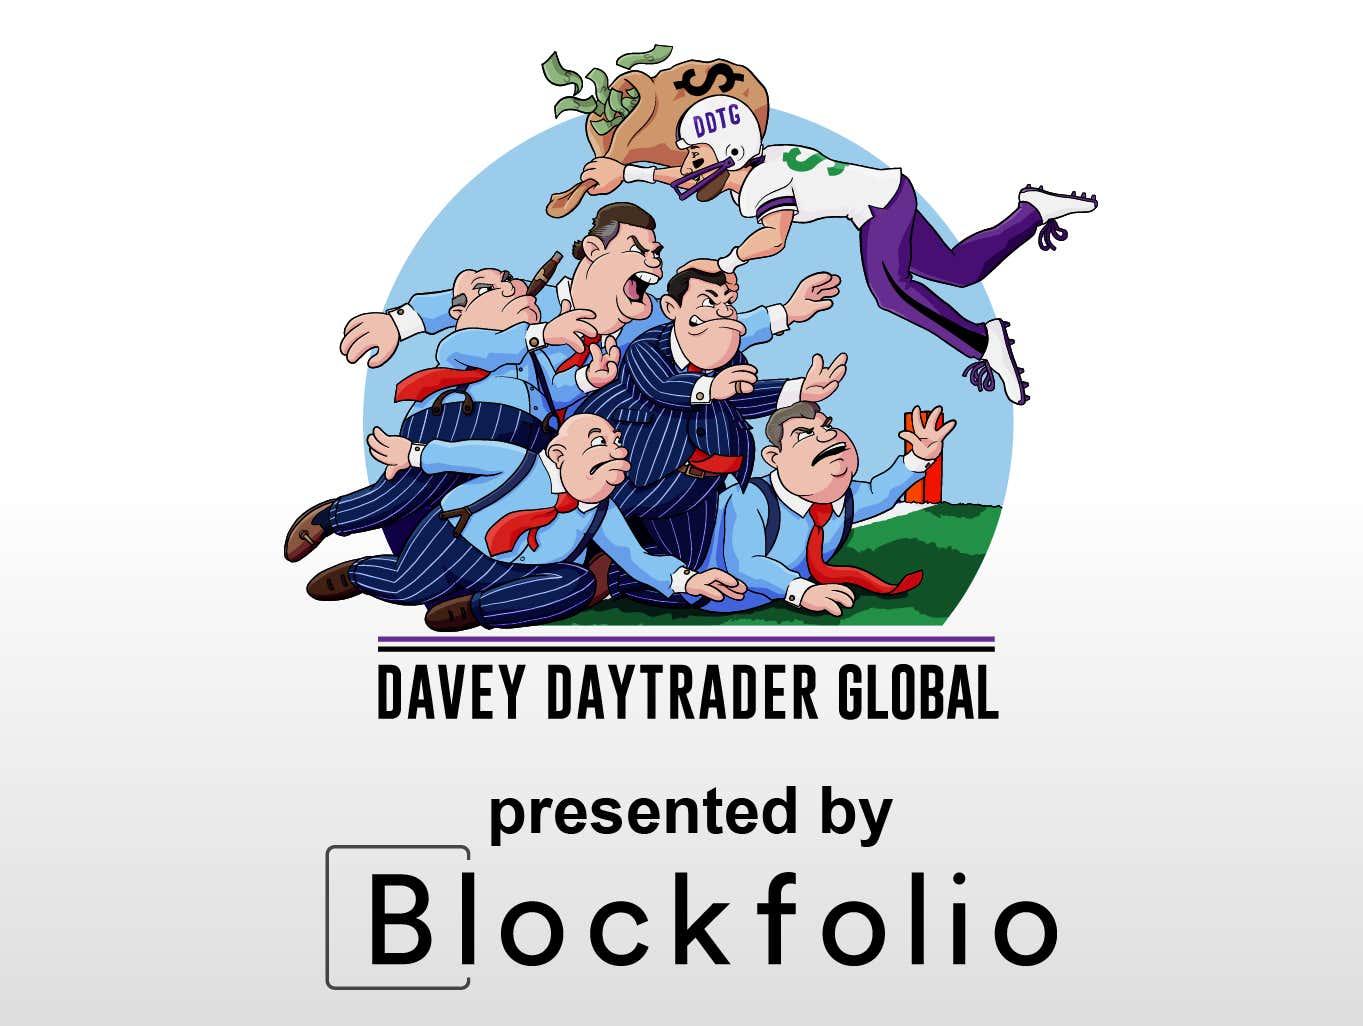 Davey Day Trader presented by Blockfolio - June 15, 2021